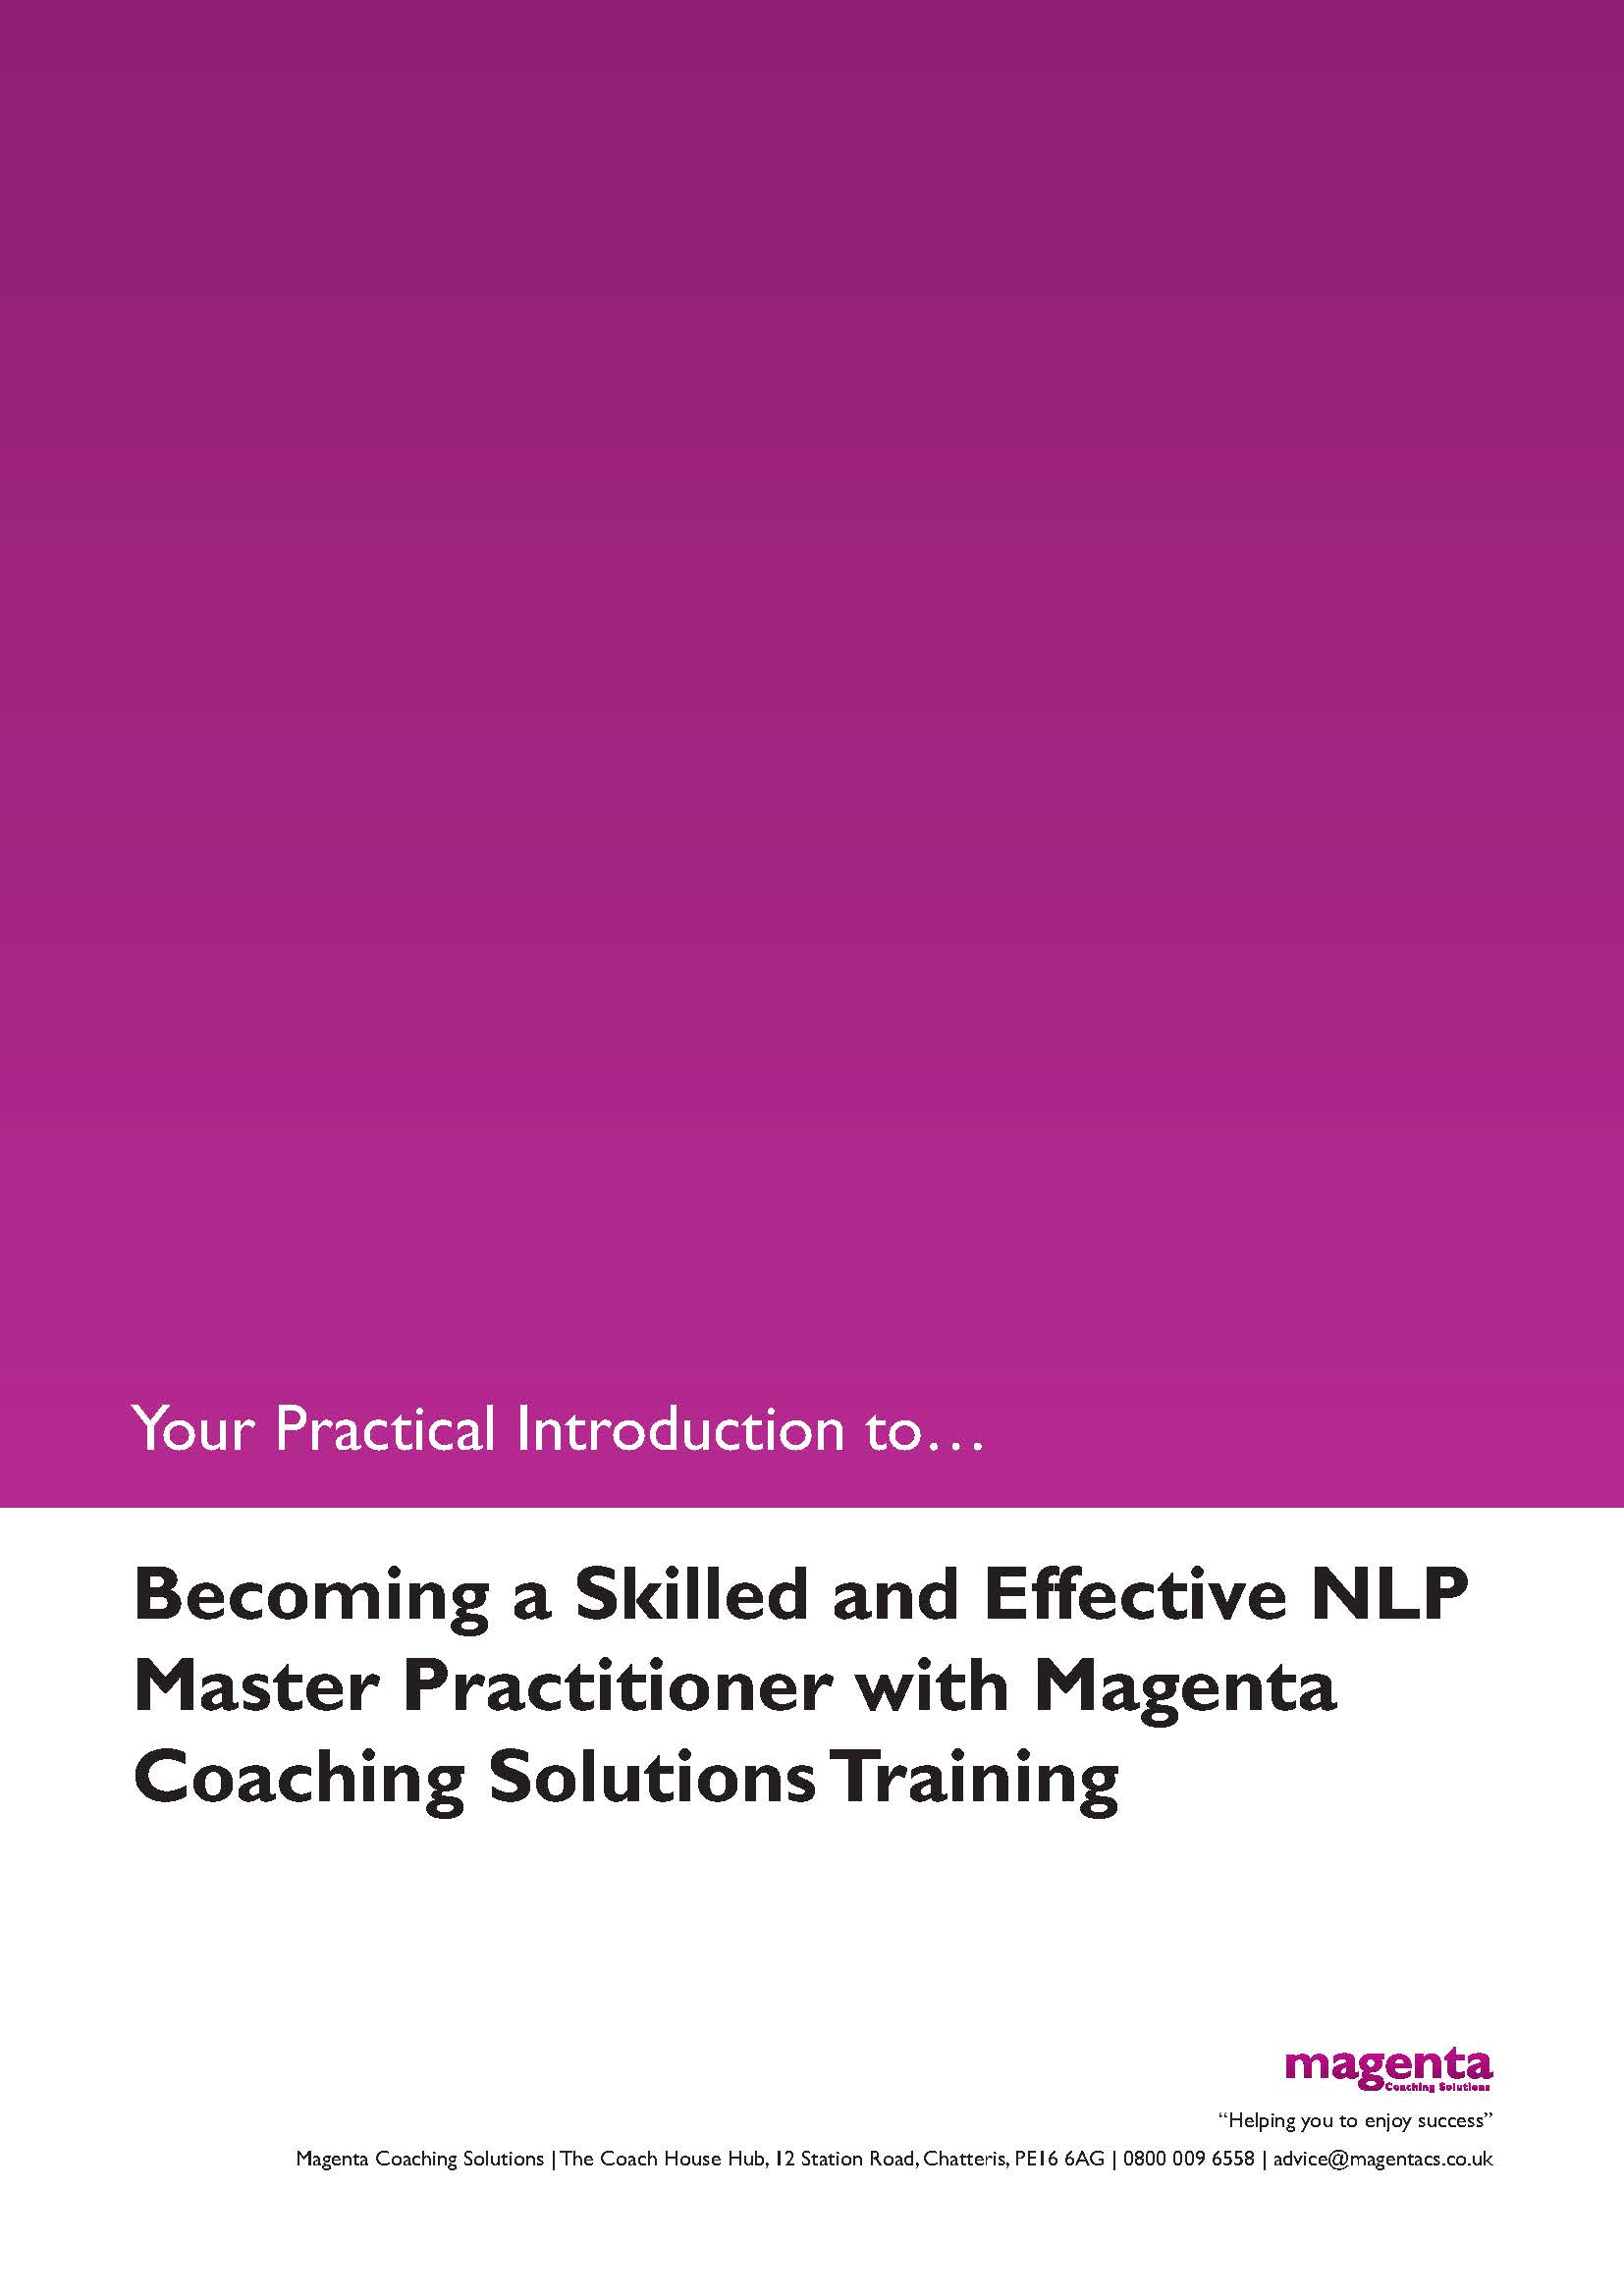 NLP Master Practitioner Guide.1